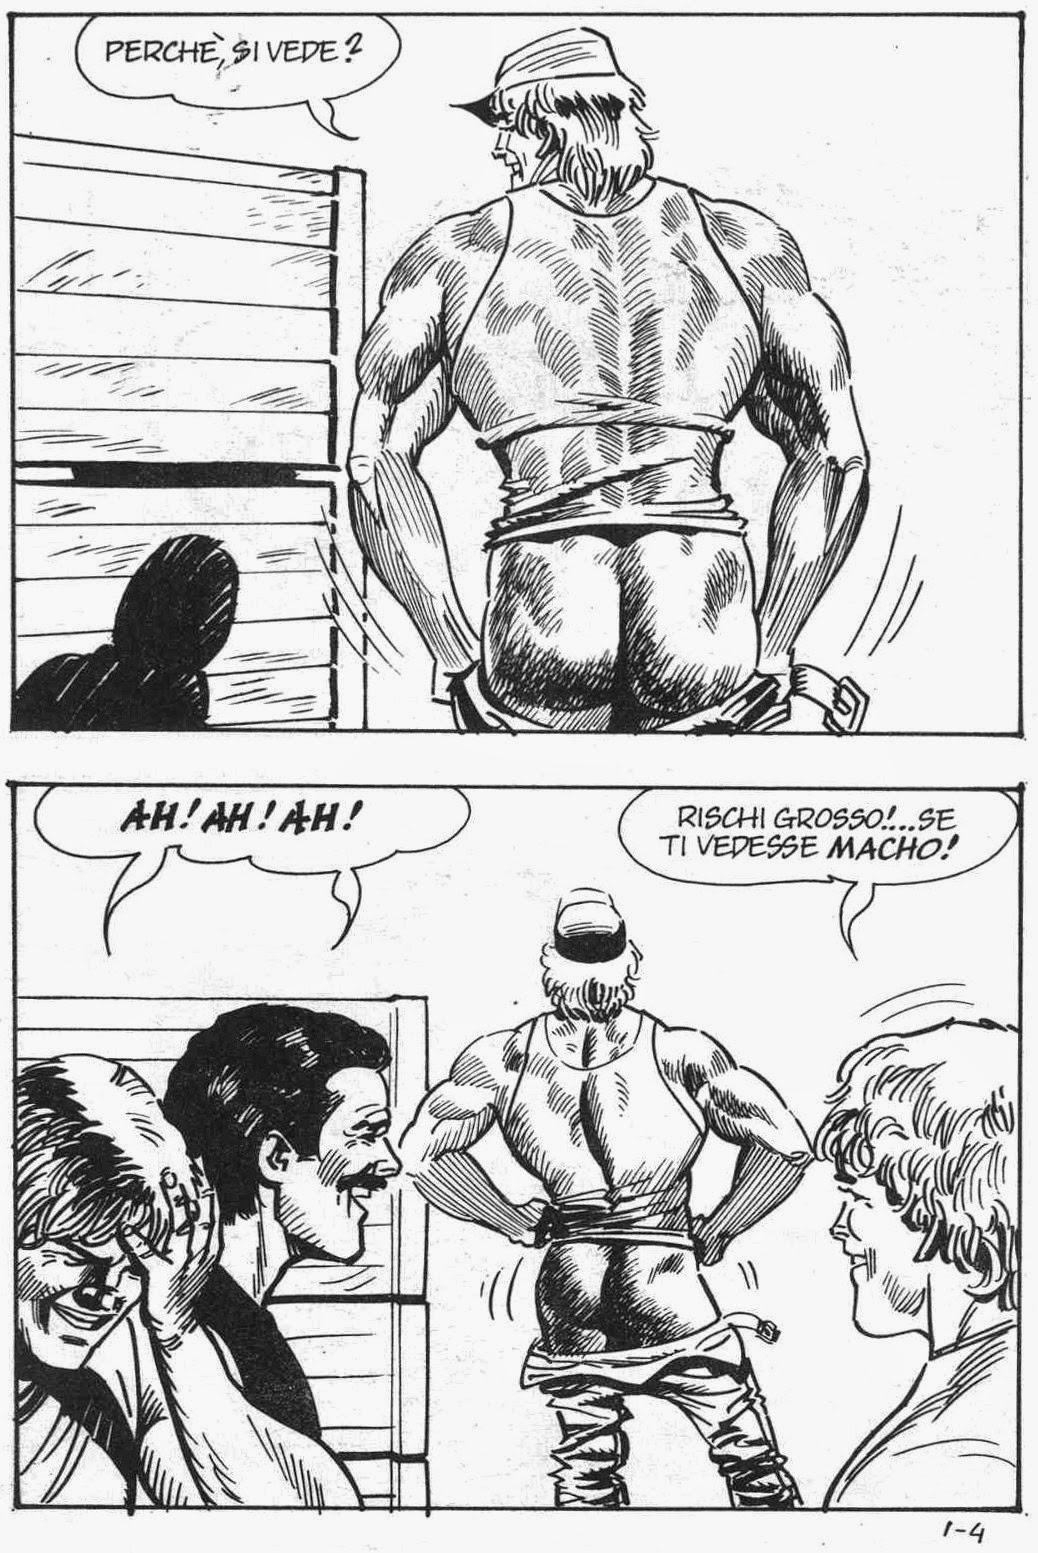 fumetti hentai italiani